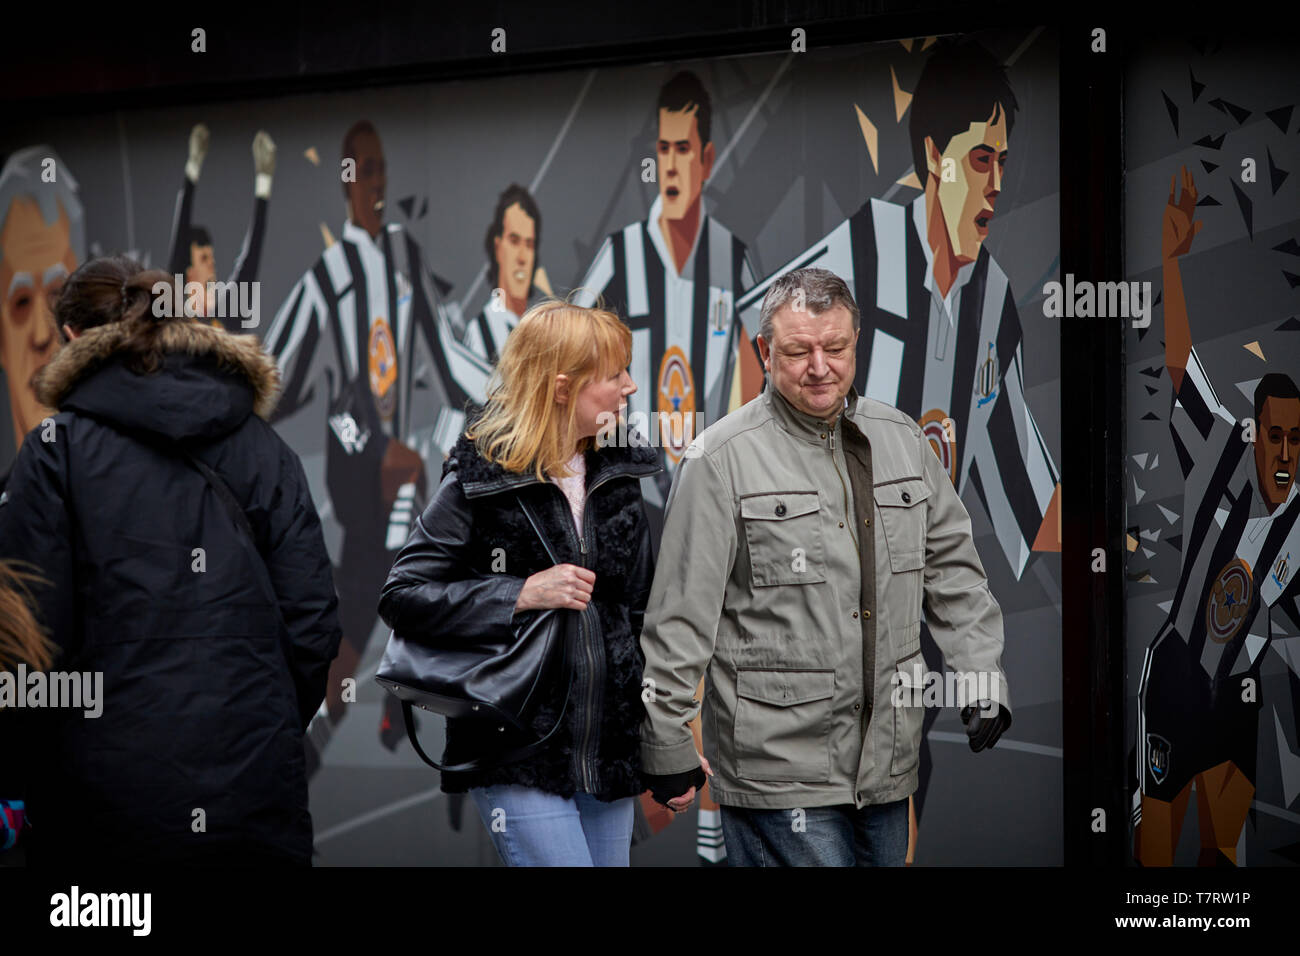 Newcastle upon Tyne, Scott's Menswear in Newcastle City Centre Wandbild ehrt Toon Legenden ... Newcastle United Wandbild Stockfoto